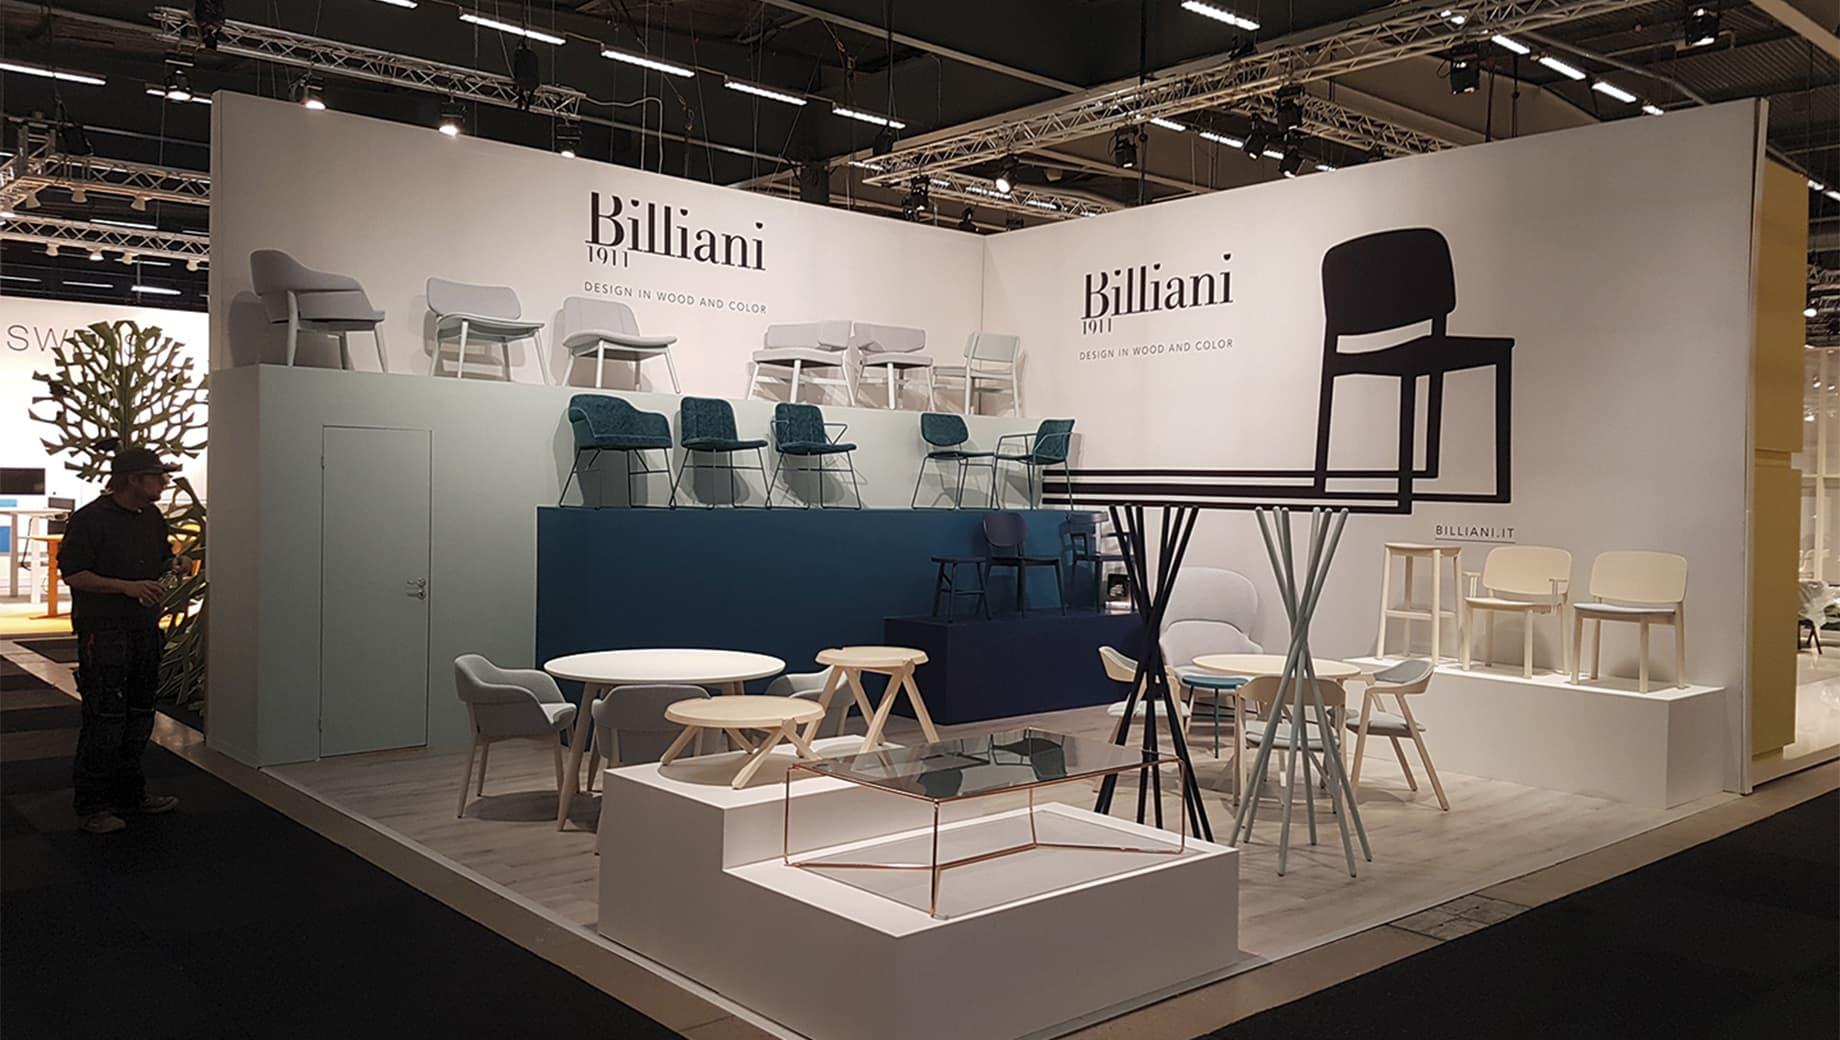 Billiani - Stockholm Furniture Fair